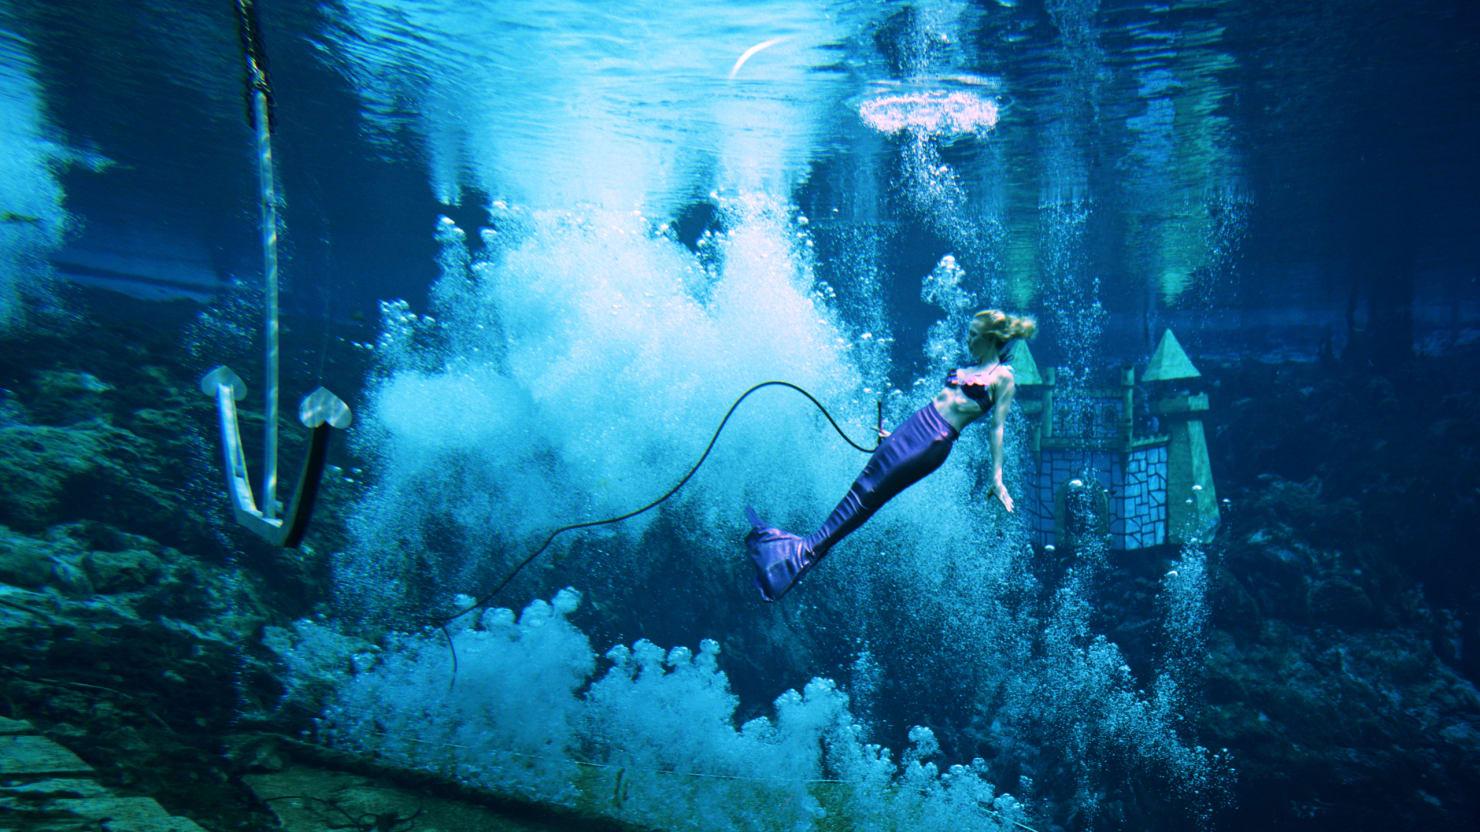 Motor City Auto >> The World's Craziest Underwater Adventures